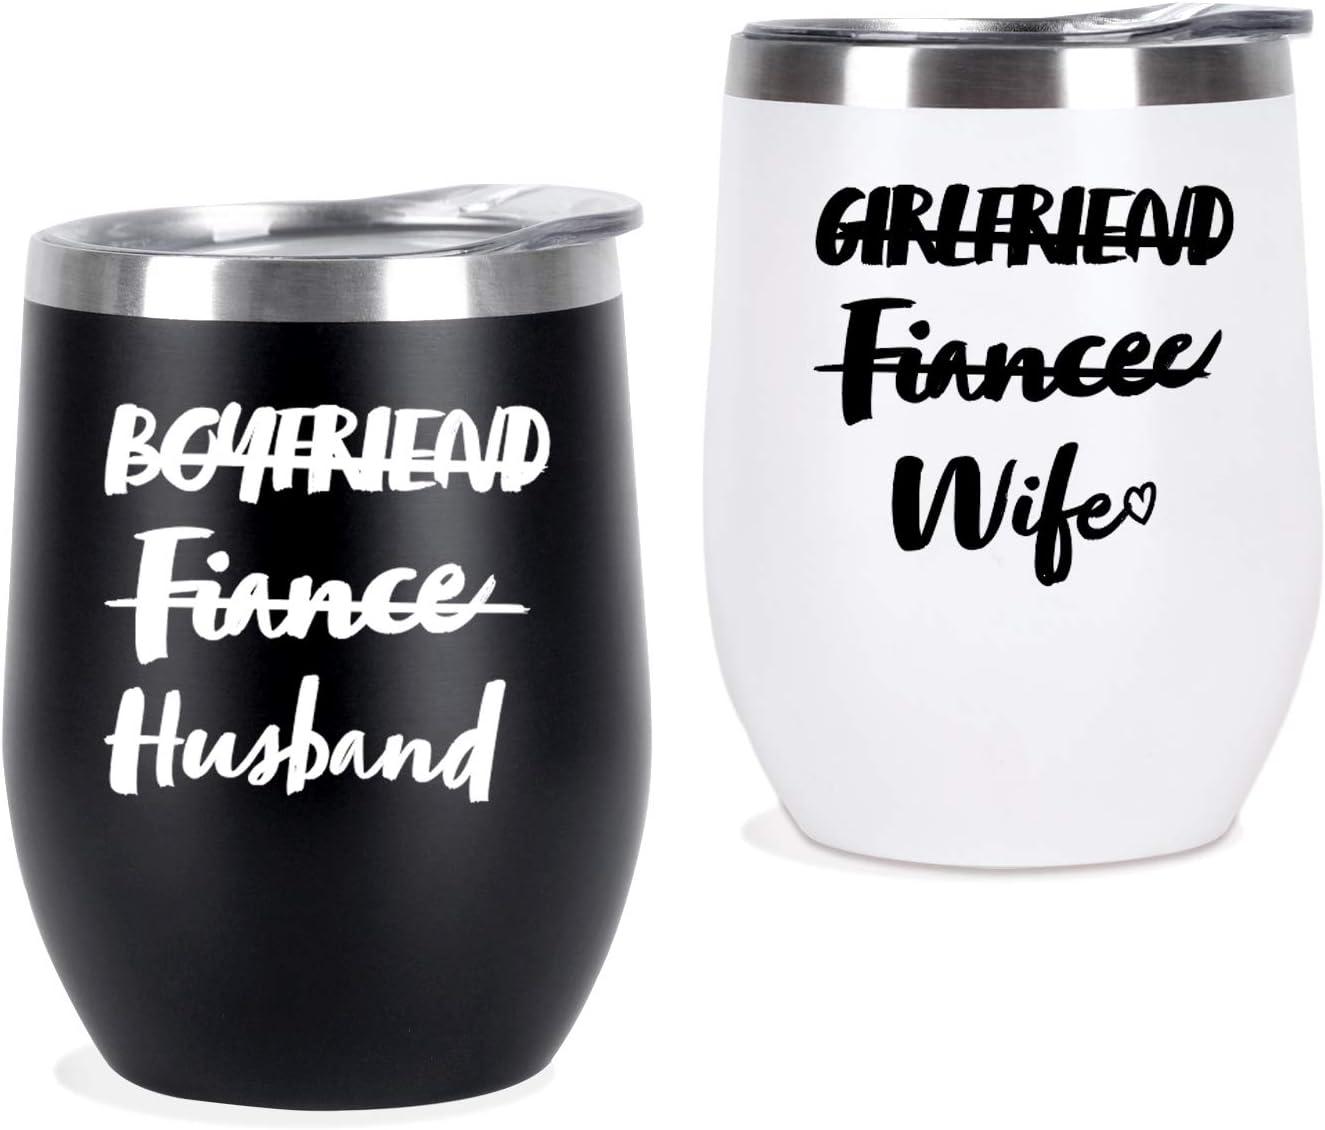 Wedding Couple Wine Tumbler Set, Funny 12 Oz Stainles Steel Tumbler Set, Funny Wedding Bridal Shower Gifts for Couple Newlywed Him Her Husband Wife